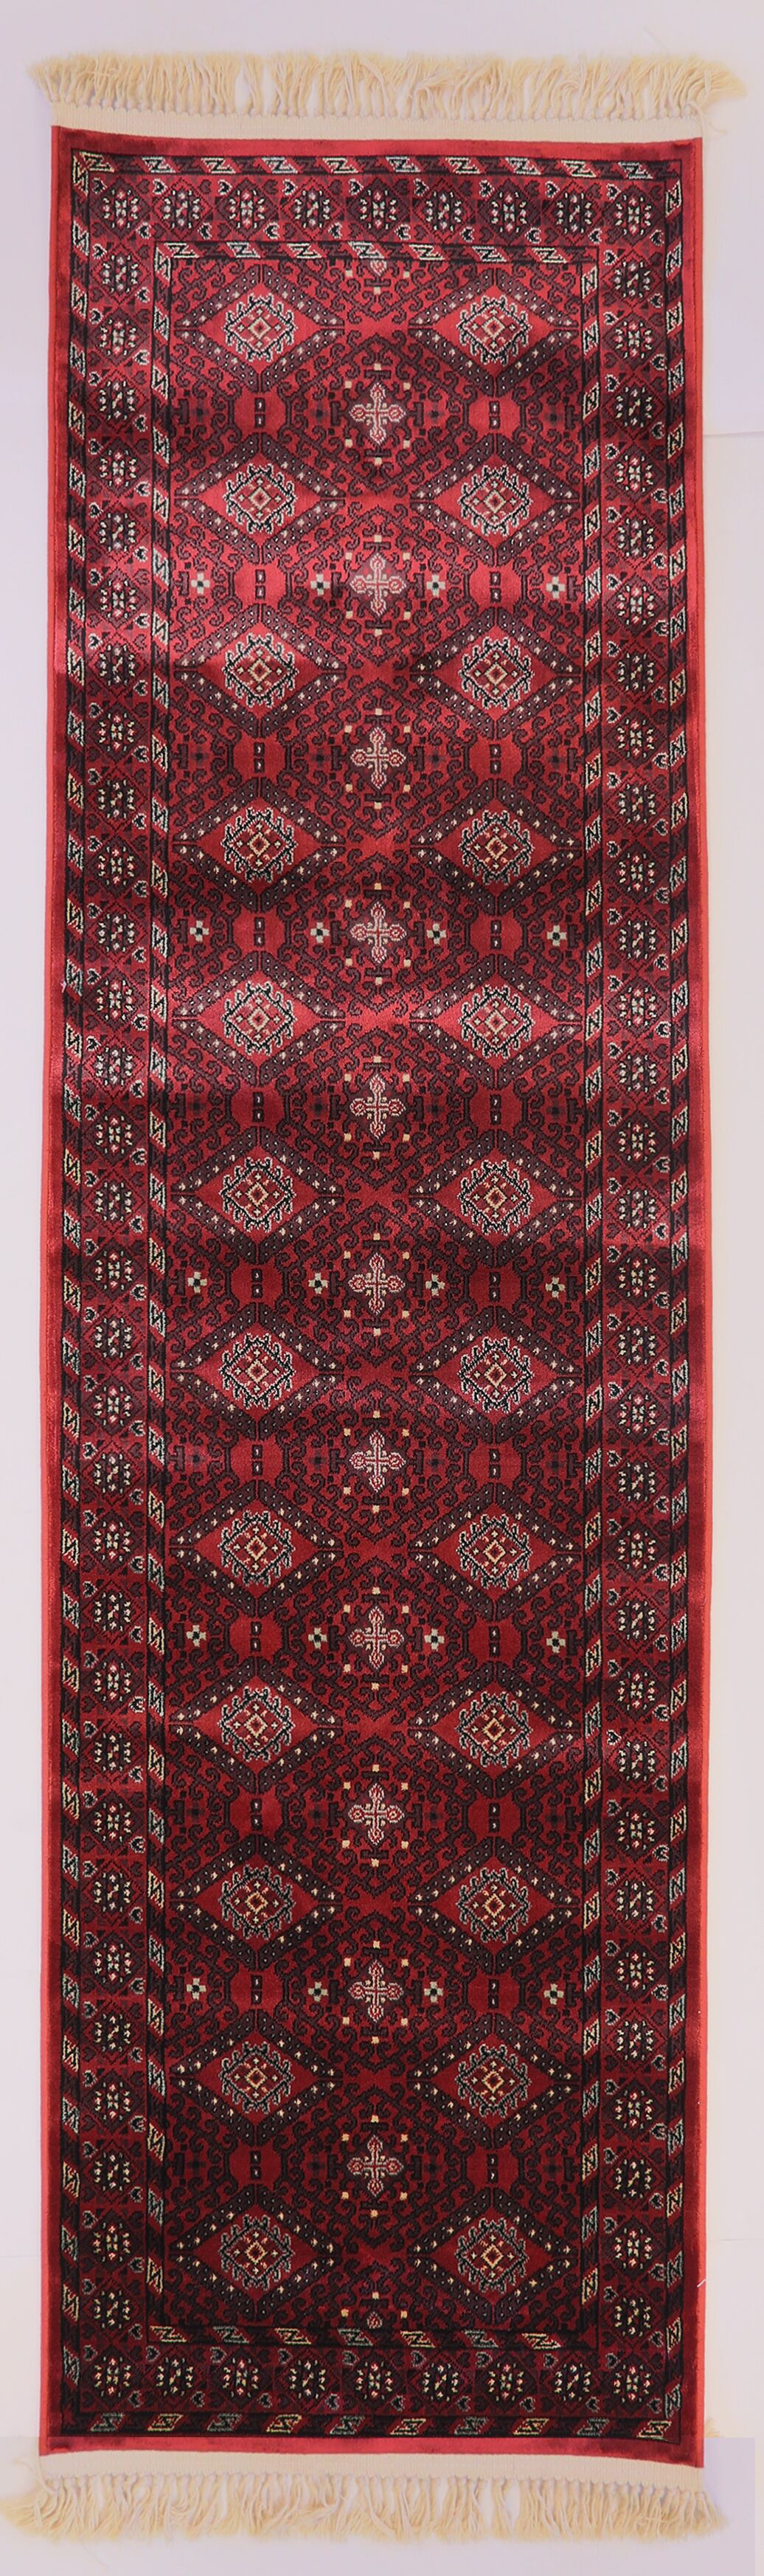 Solange Red Area Rug Rug Size: Rectangle 9'2